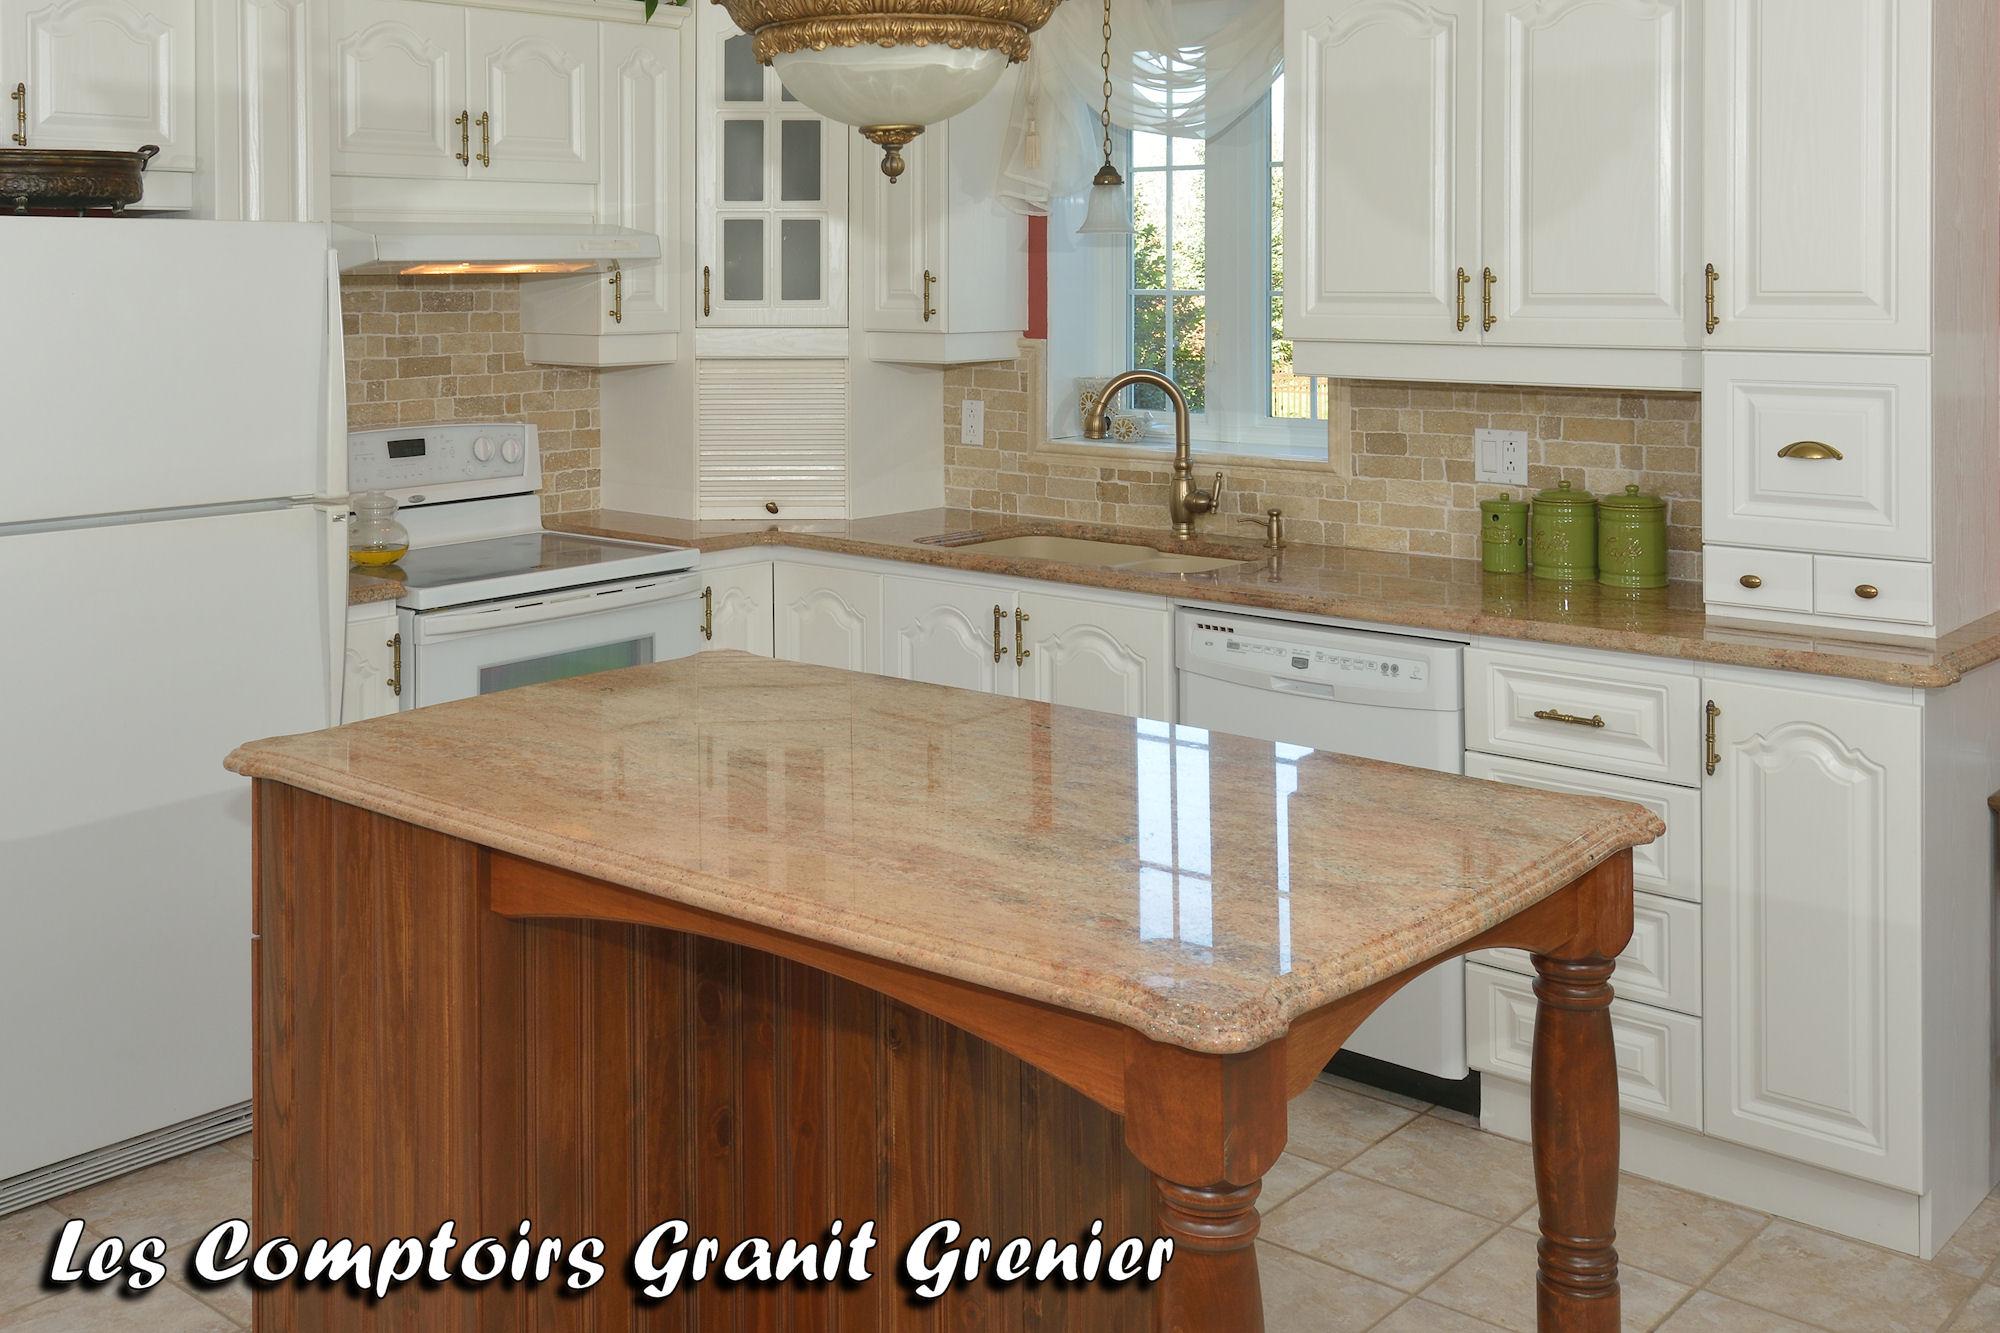 comptoir de granit et quartz r alisations de cuisines et vanit s. Black Bedroom Furniture Sets. Home Design Ideas